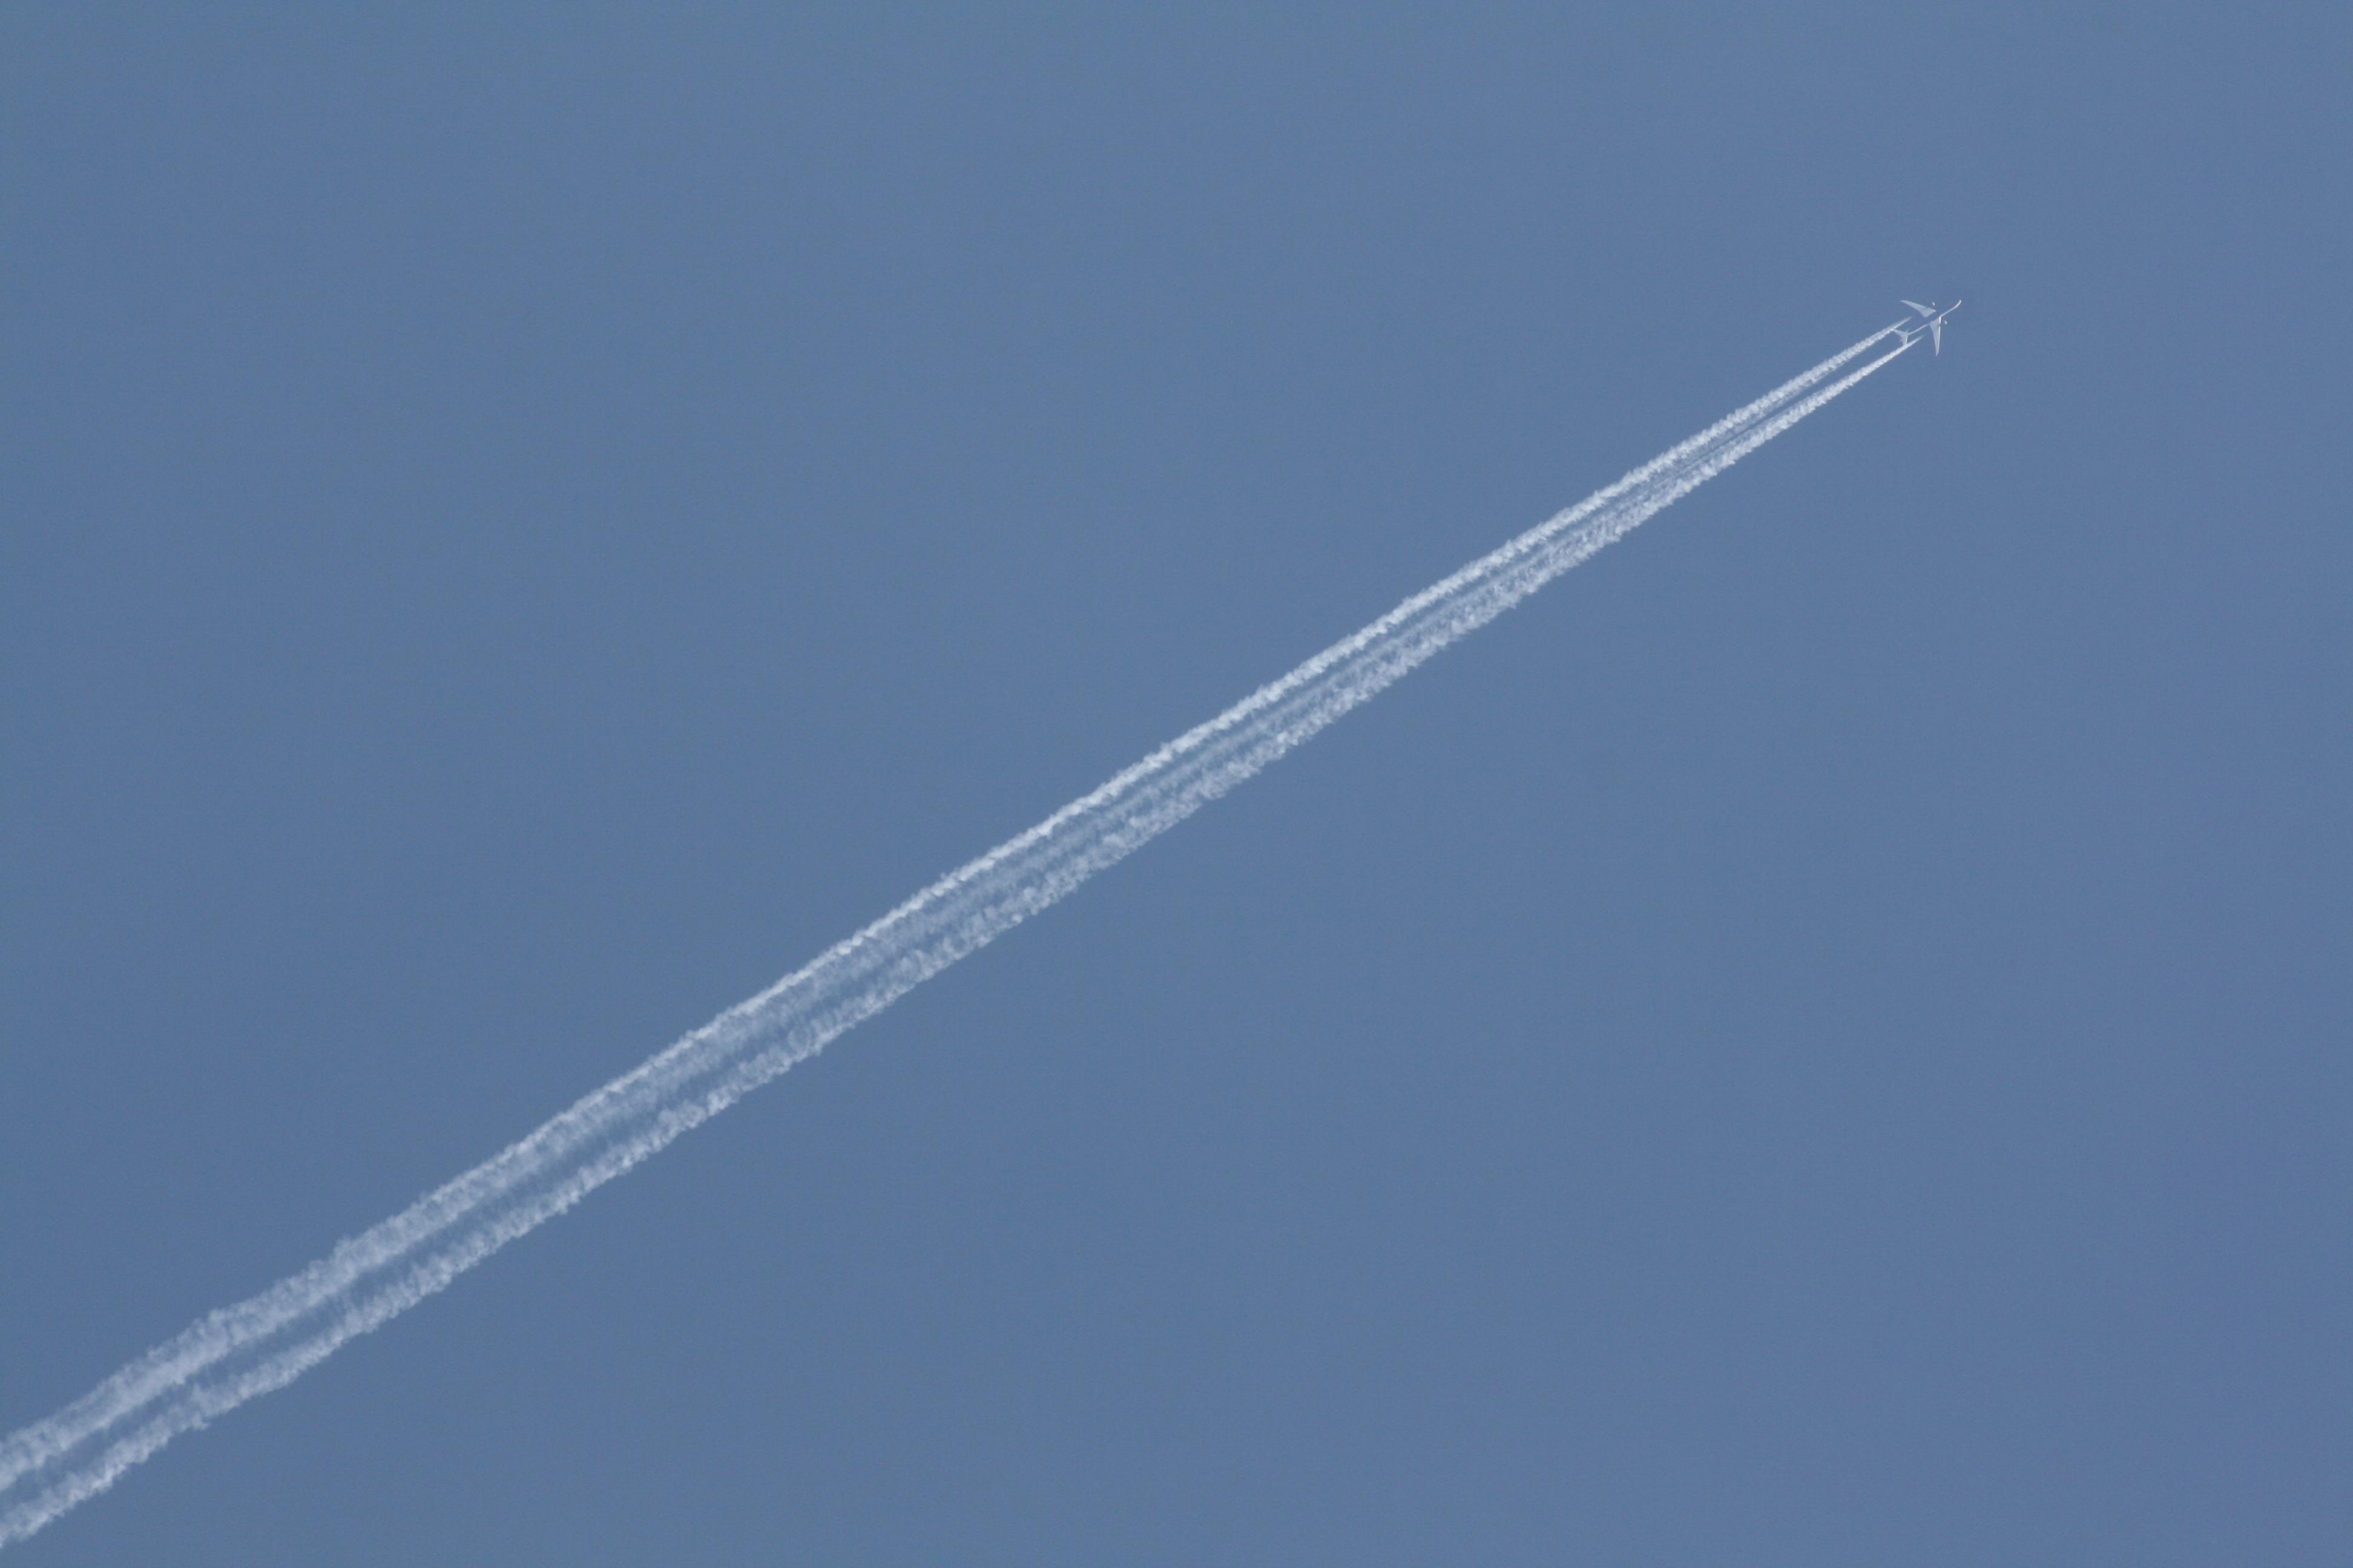 Naam: Boeing backgarden.jpg Bekeken: 585 Grootte: 391,7 KB